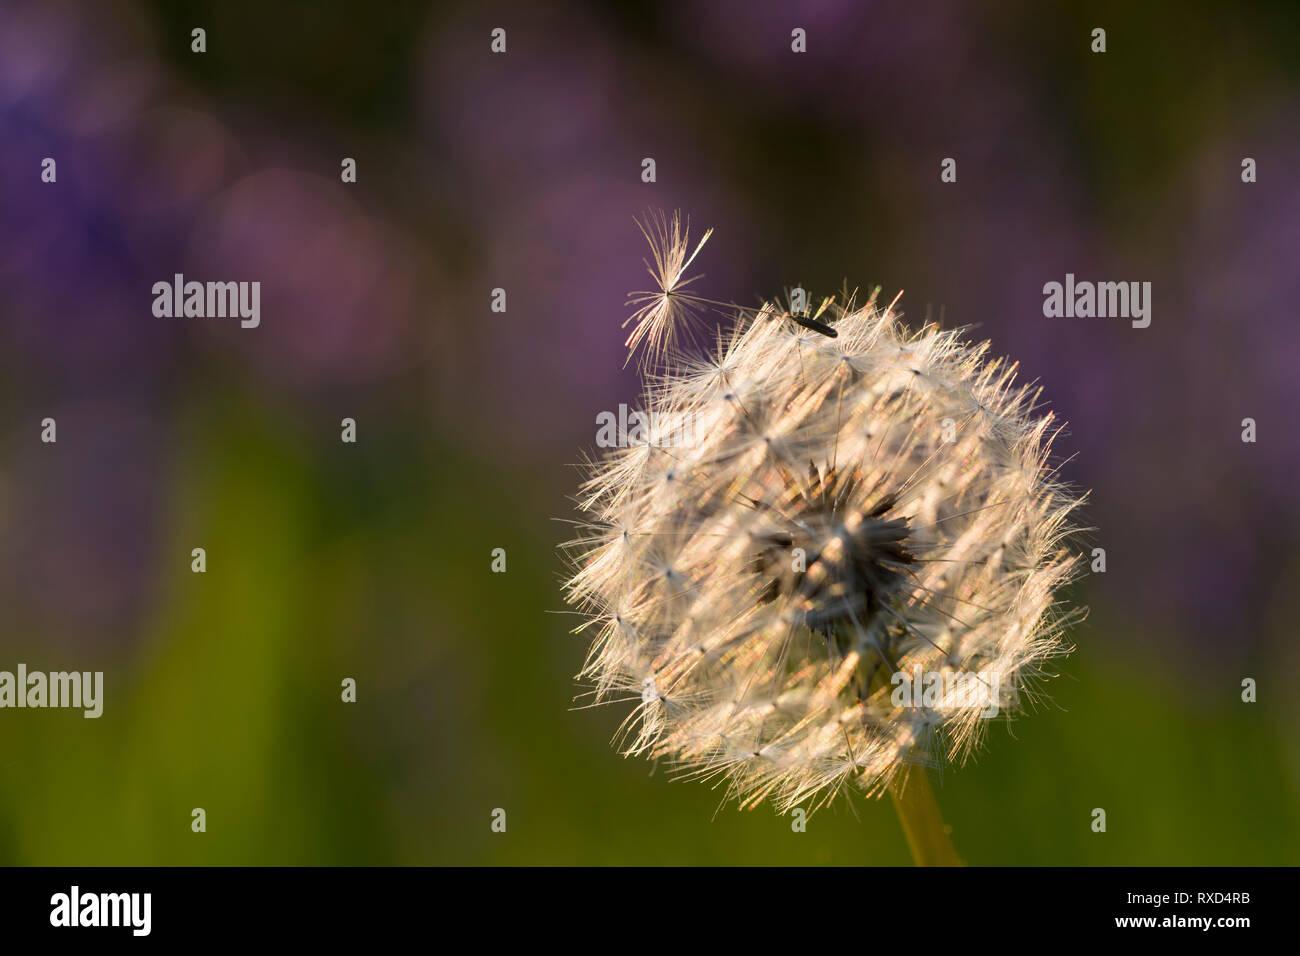 Dandelion Seedhead; Taraxacum officinale; Cornwall; UK - Stock Image